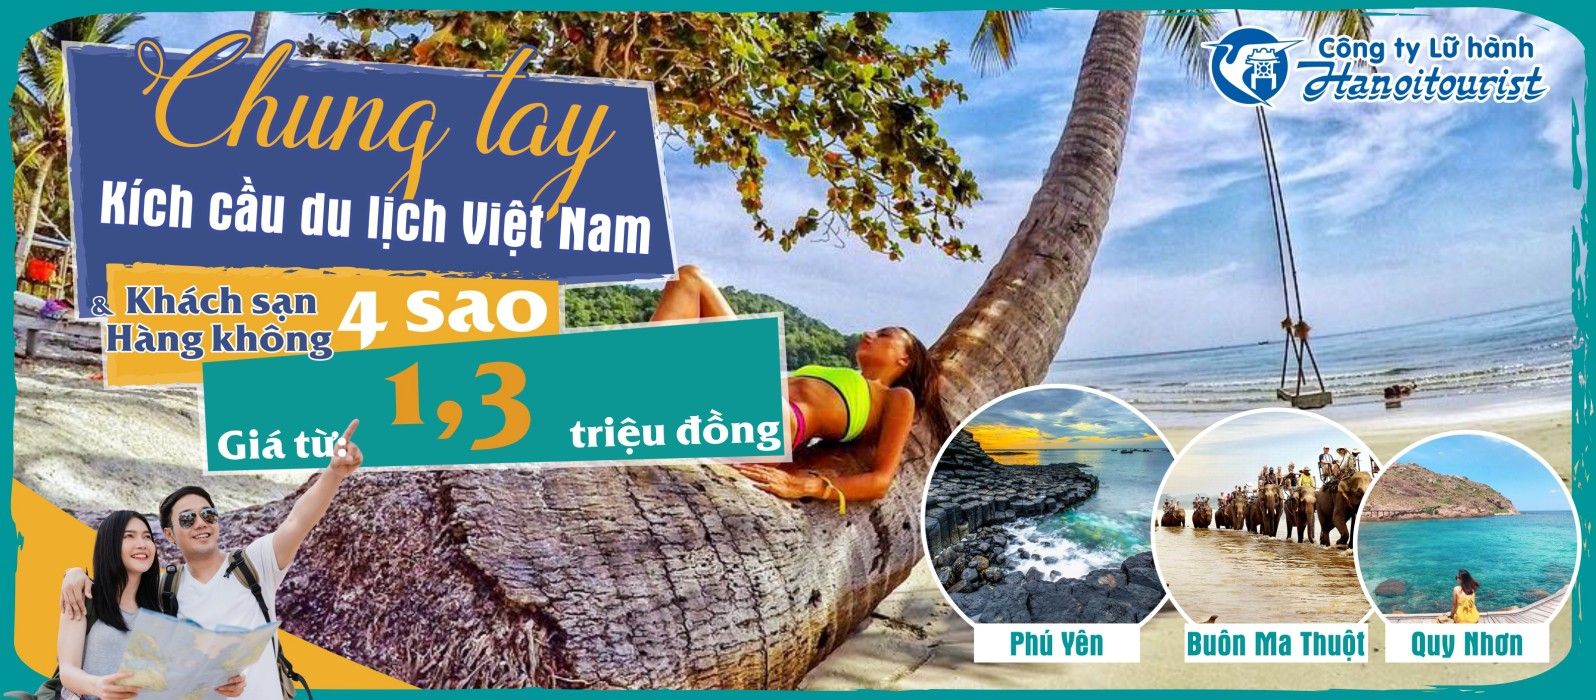 Tour kích cầu DL Việt